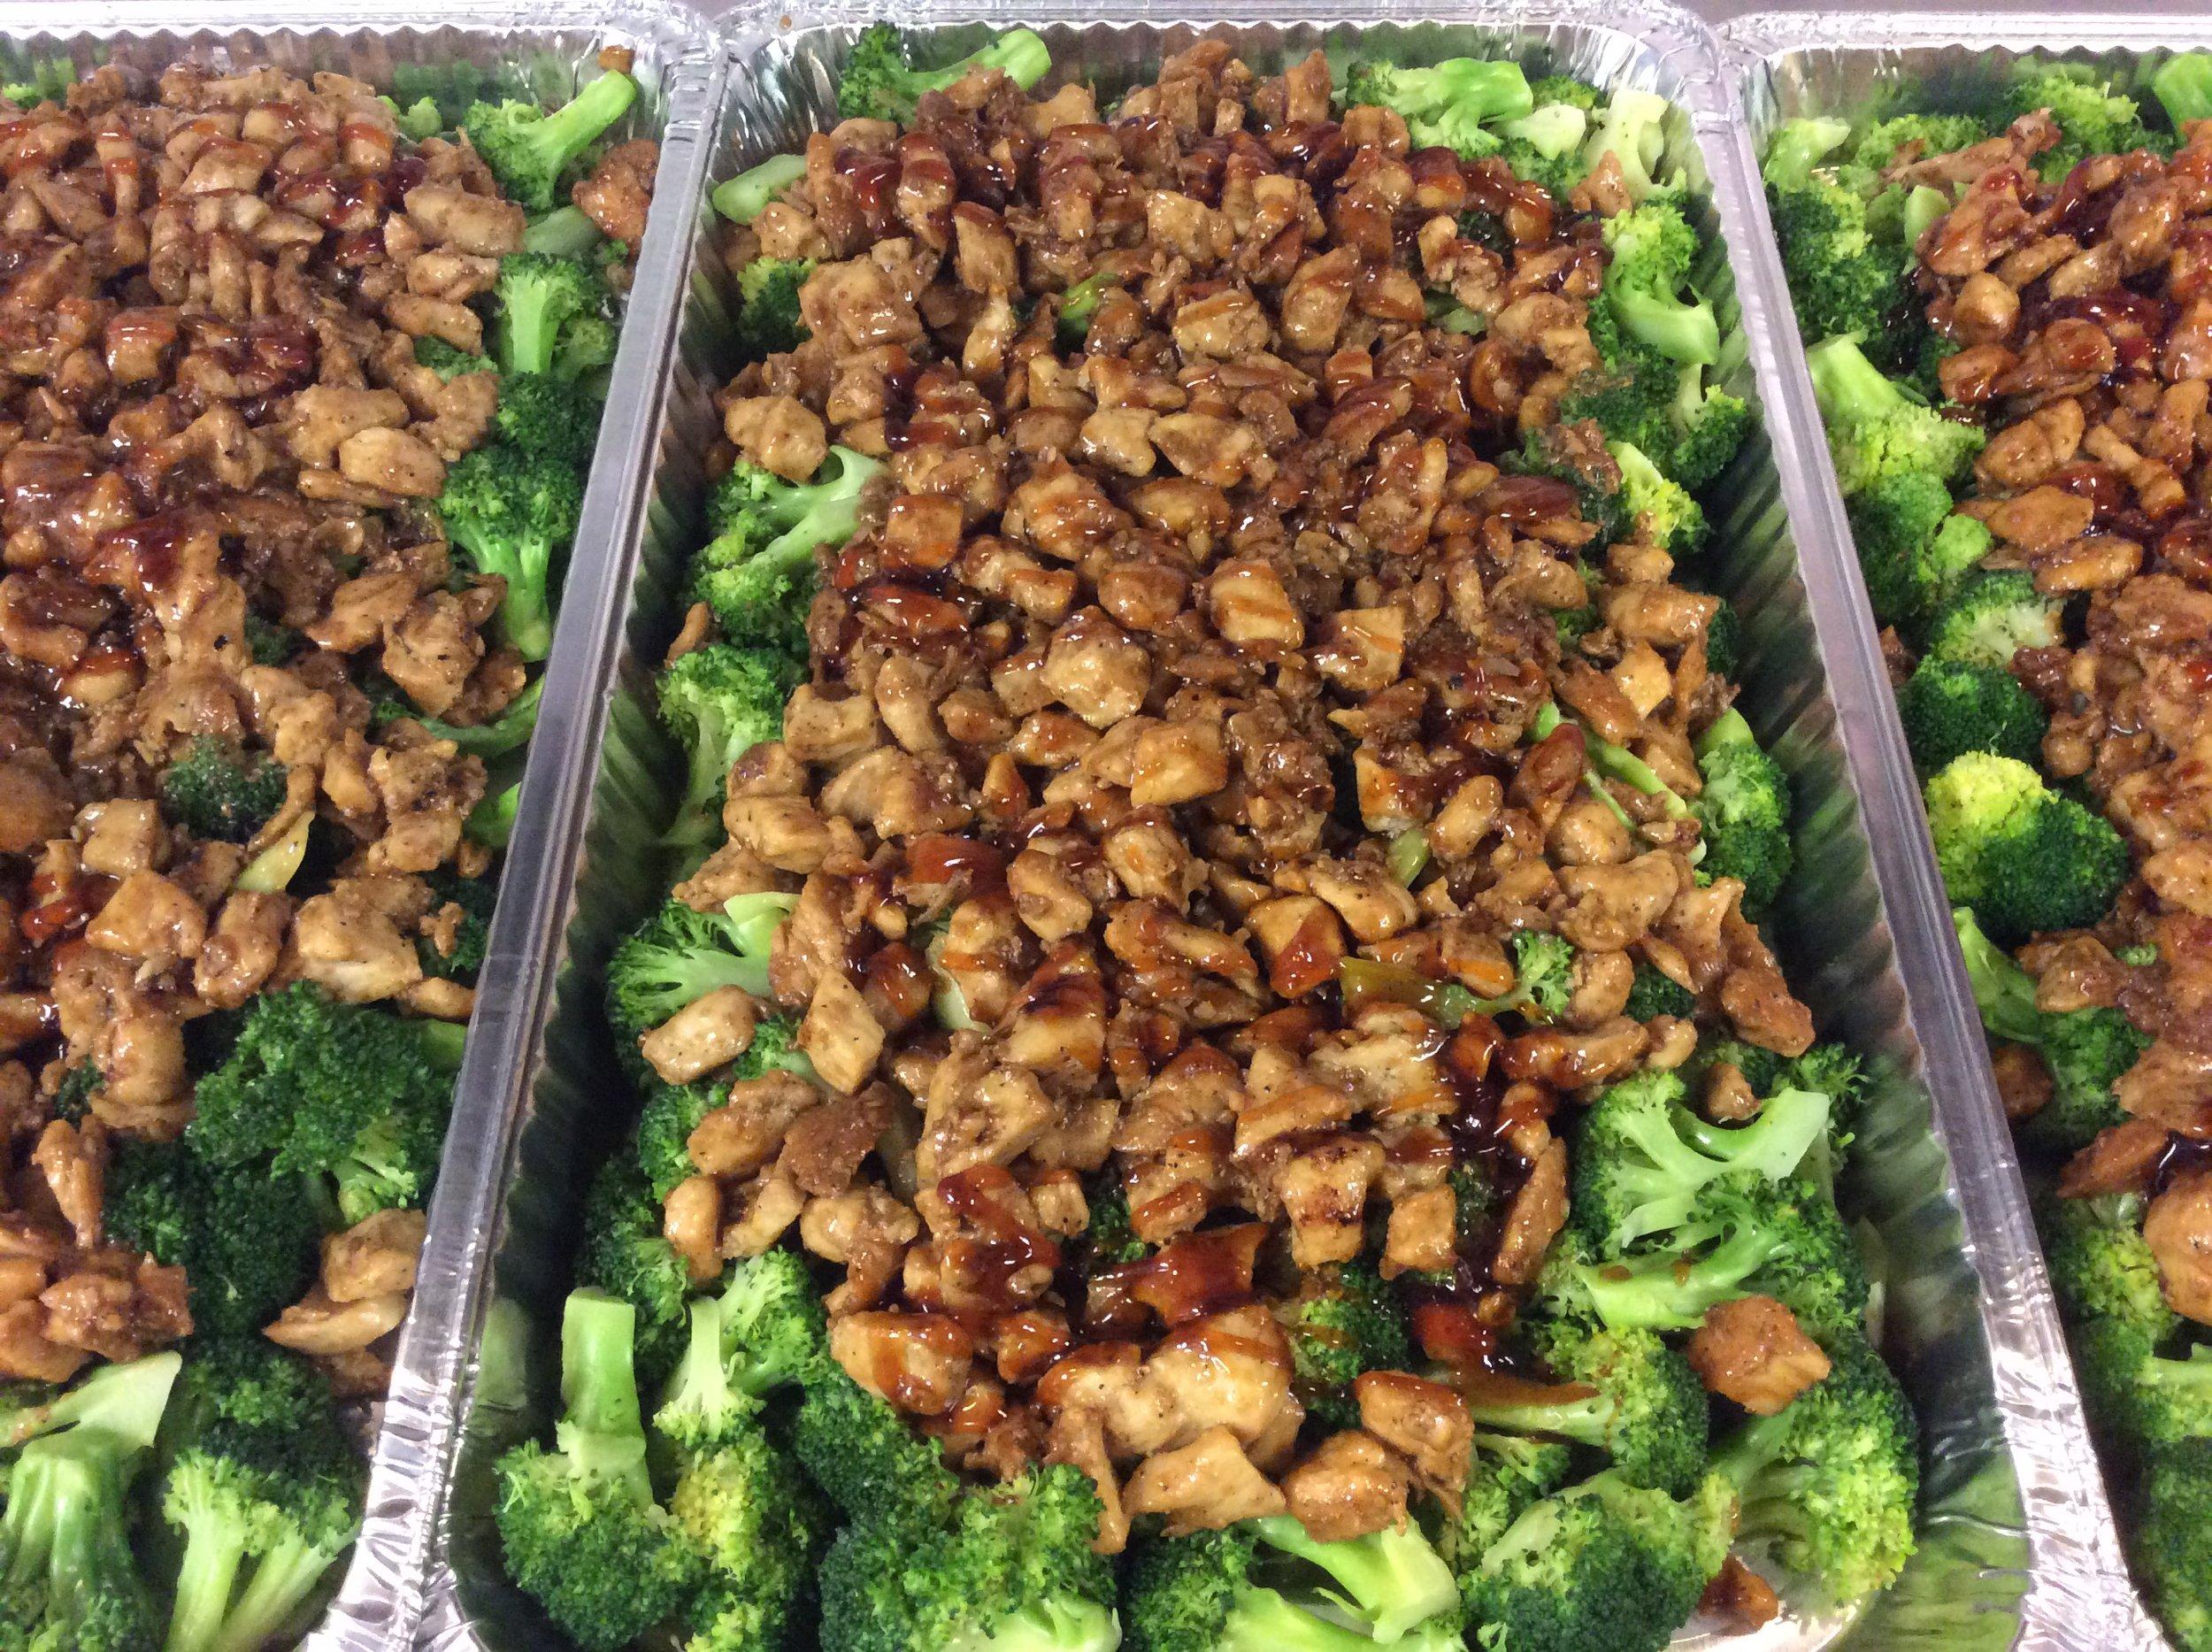 Grilled Teriyaki Chicken Breast